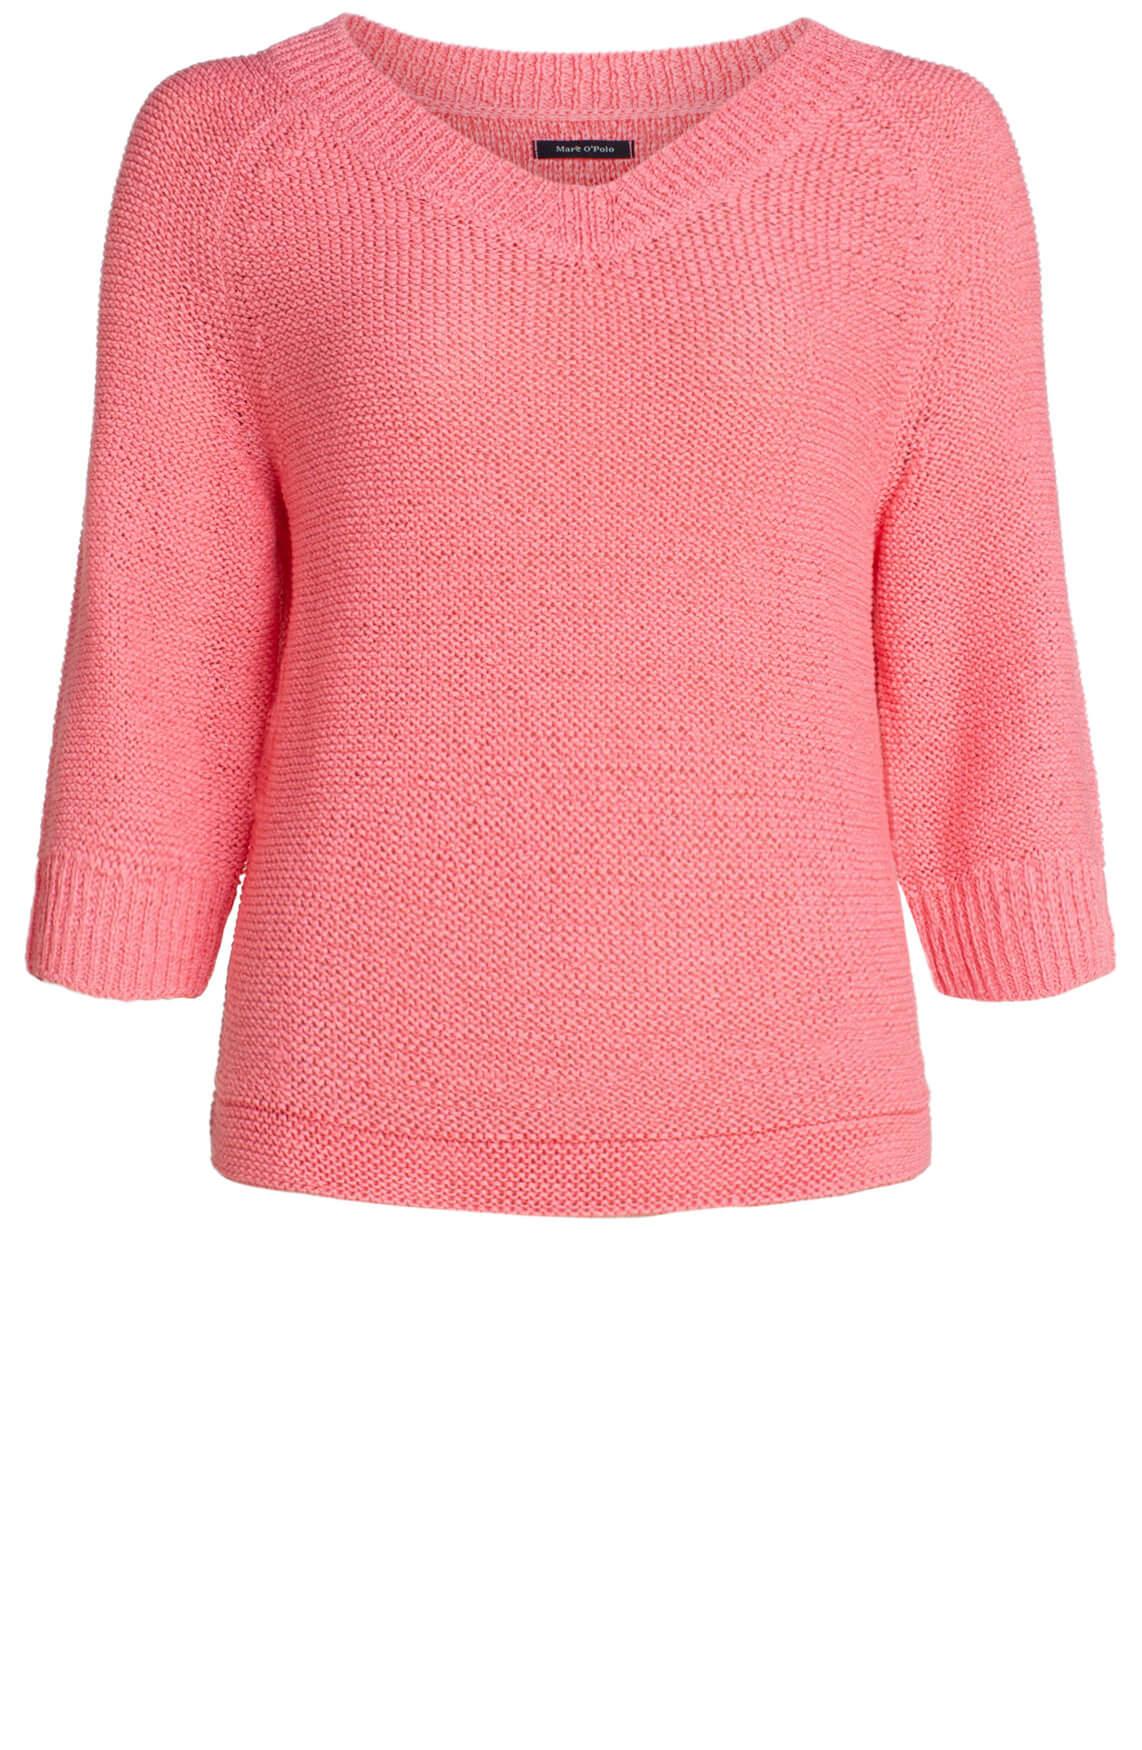 Marc O'Polo Dames Gebreide pullover met V-hals roze